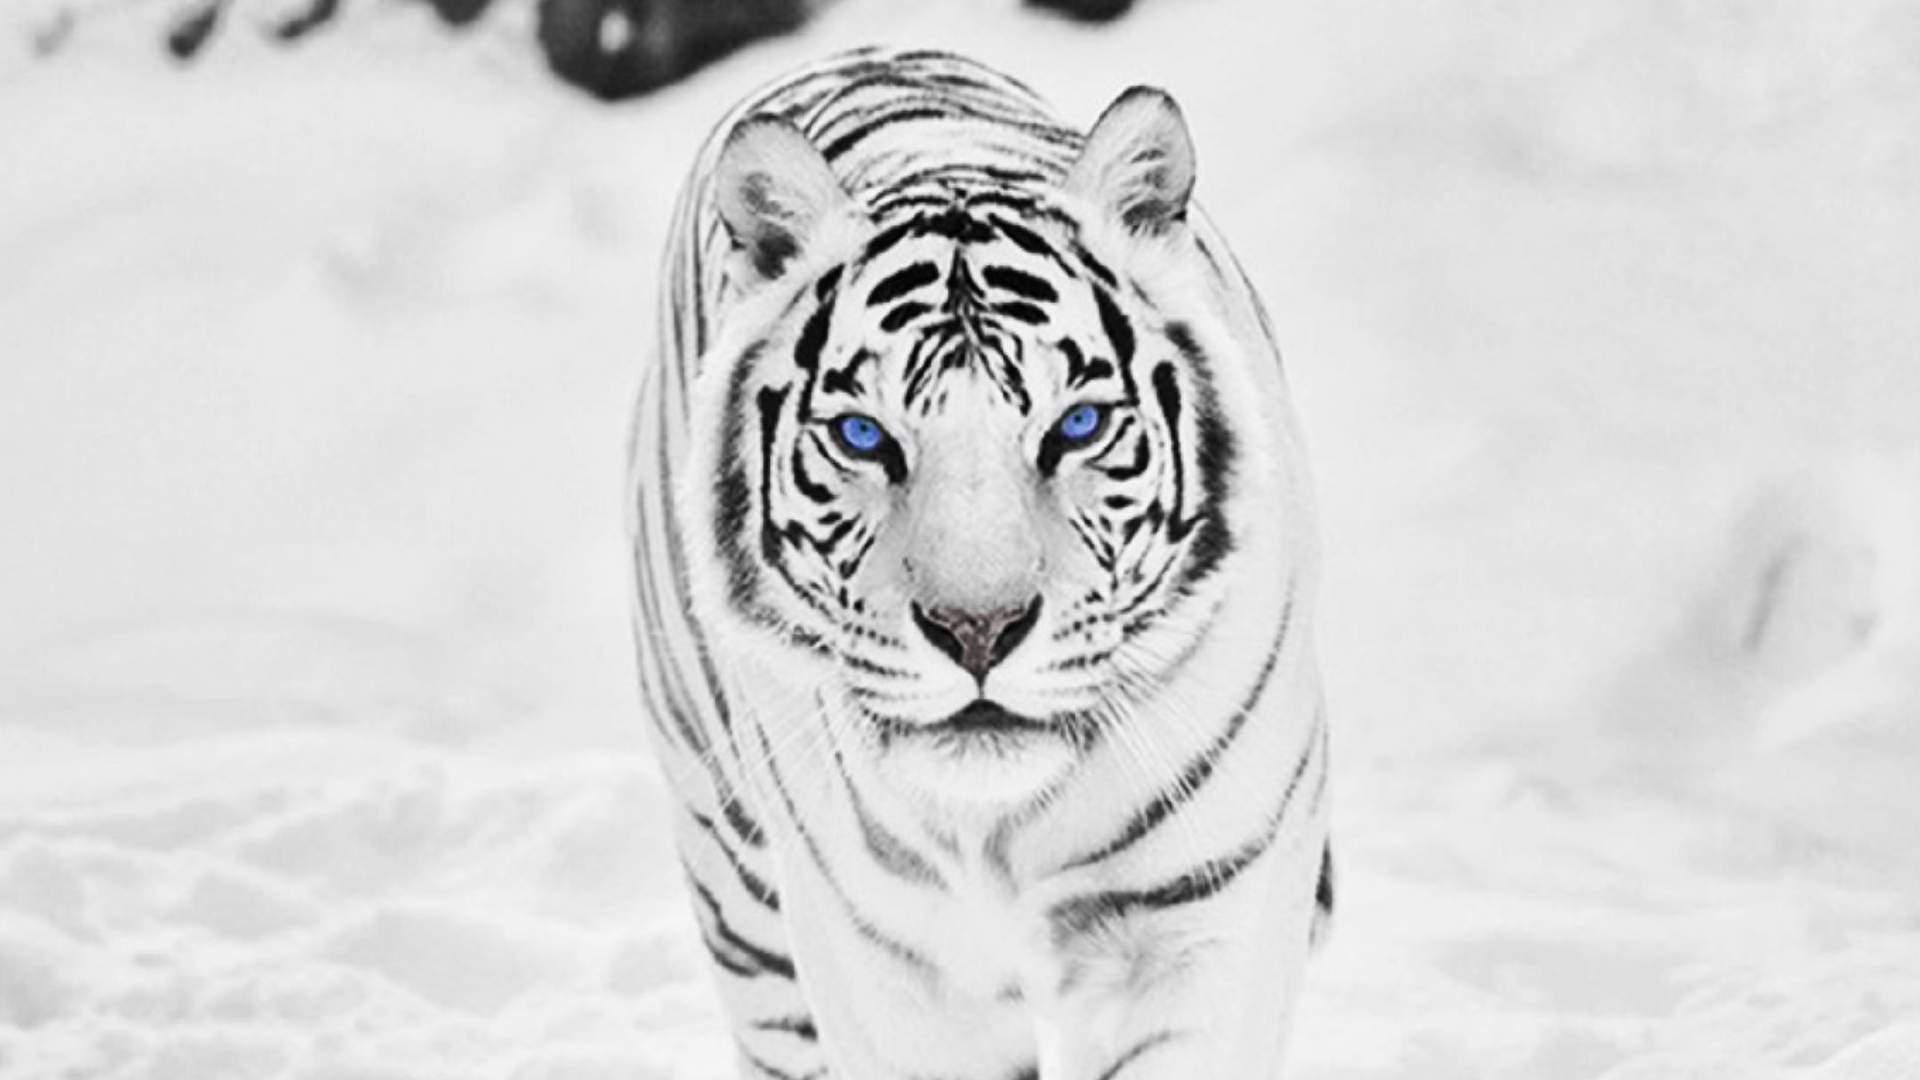 Beautiful Wallpaper Desktop Background Wild Animal - f8683726cbaeae89f406630a9a8686b9  Photograph_483495 .png